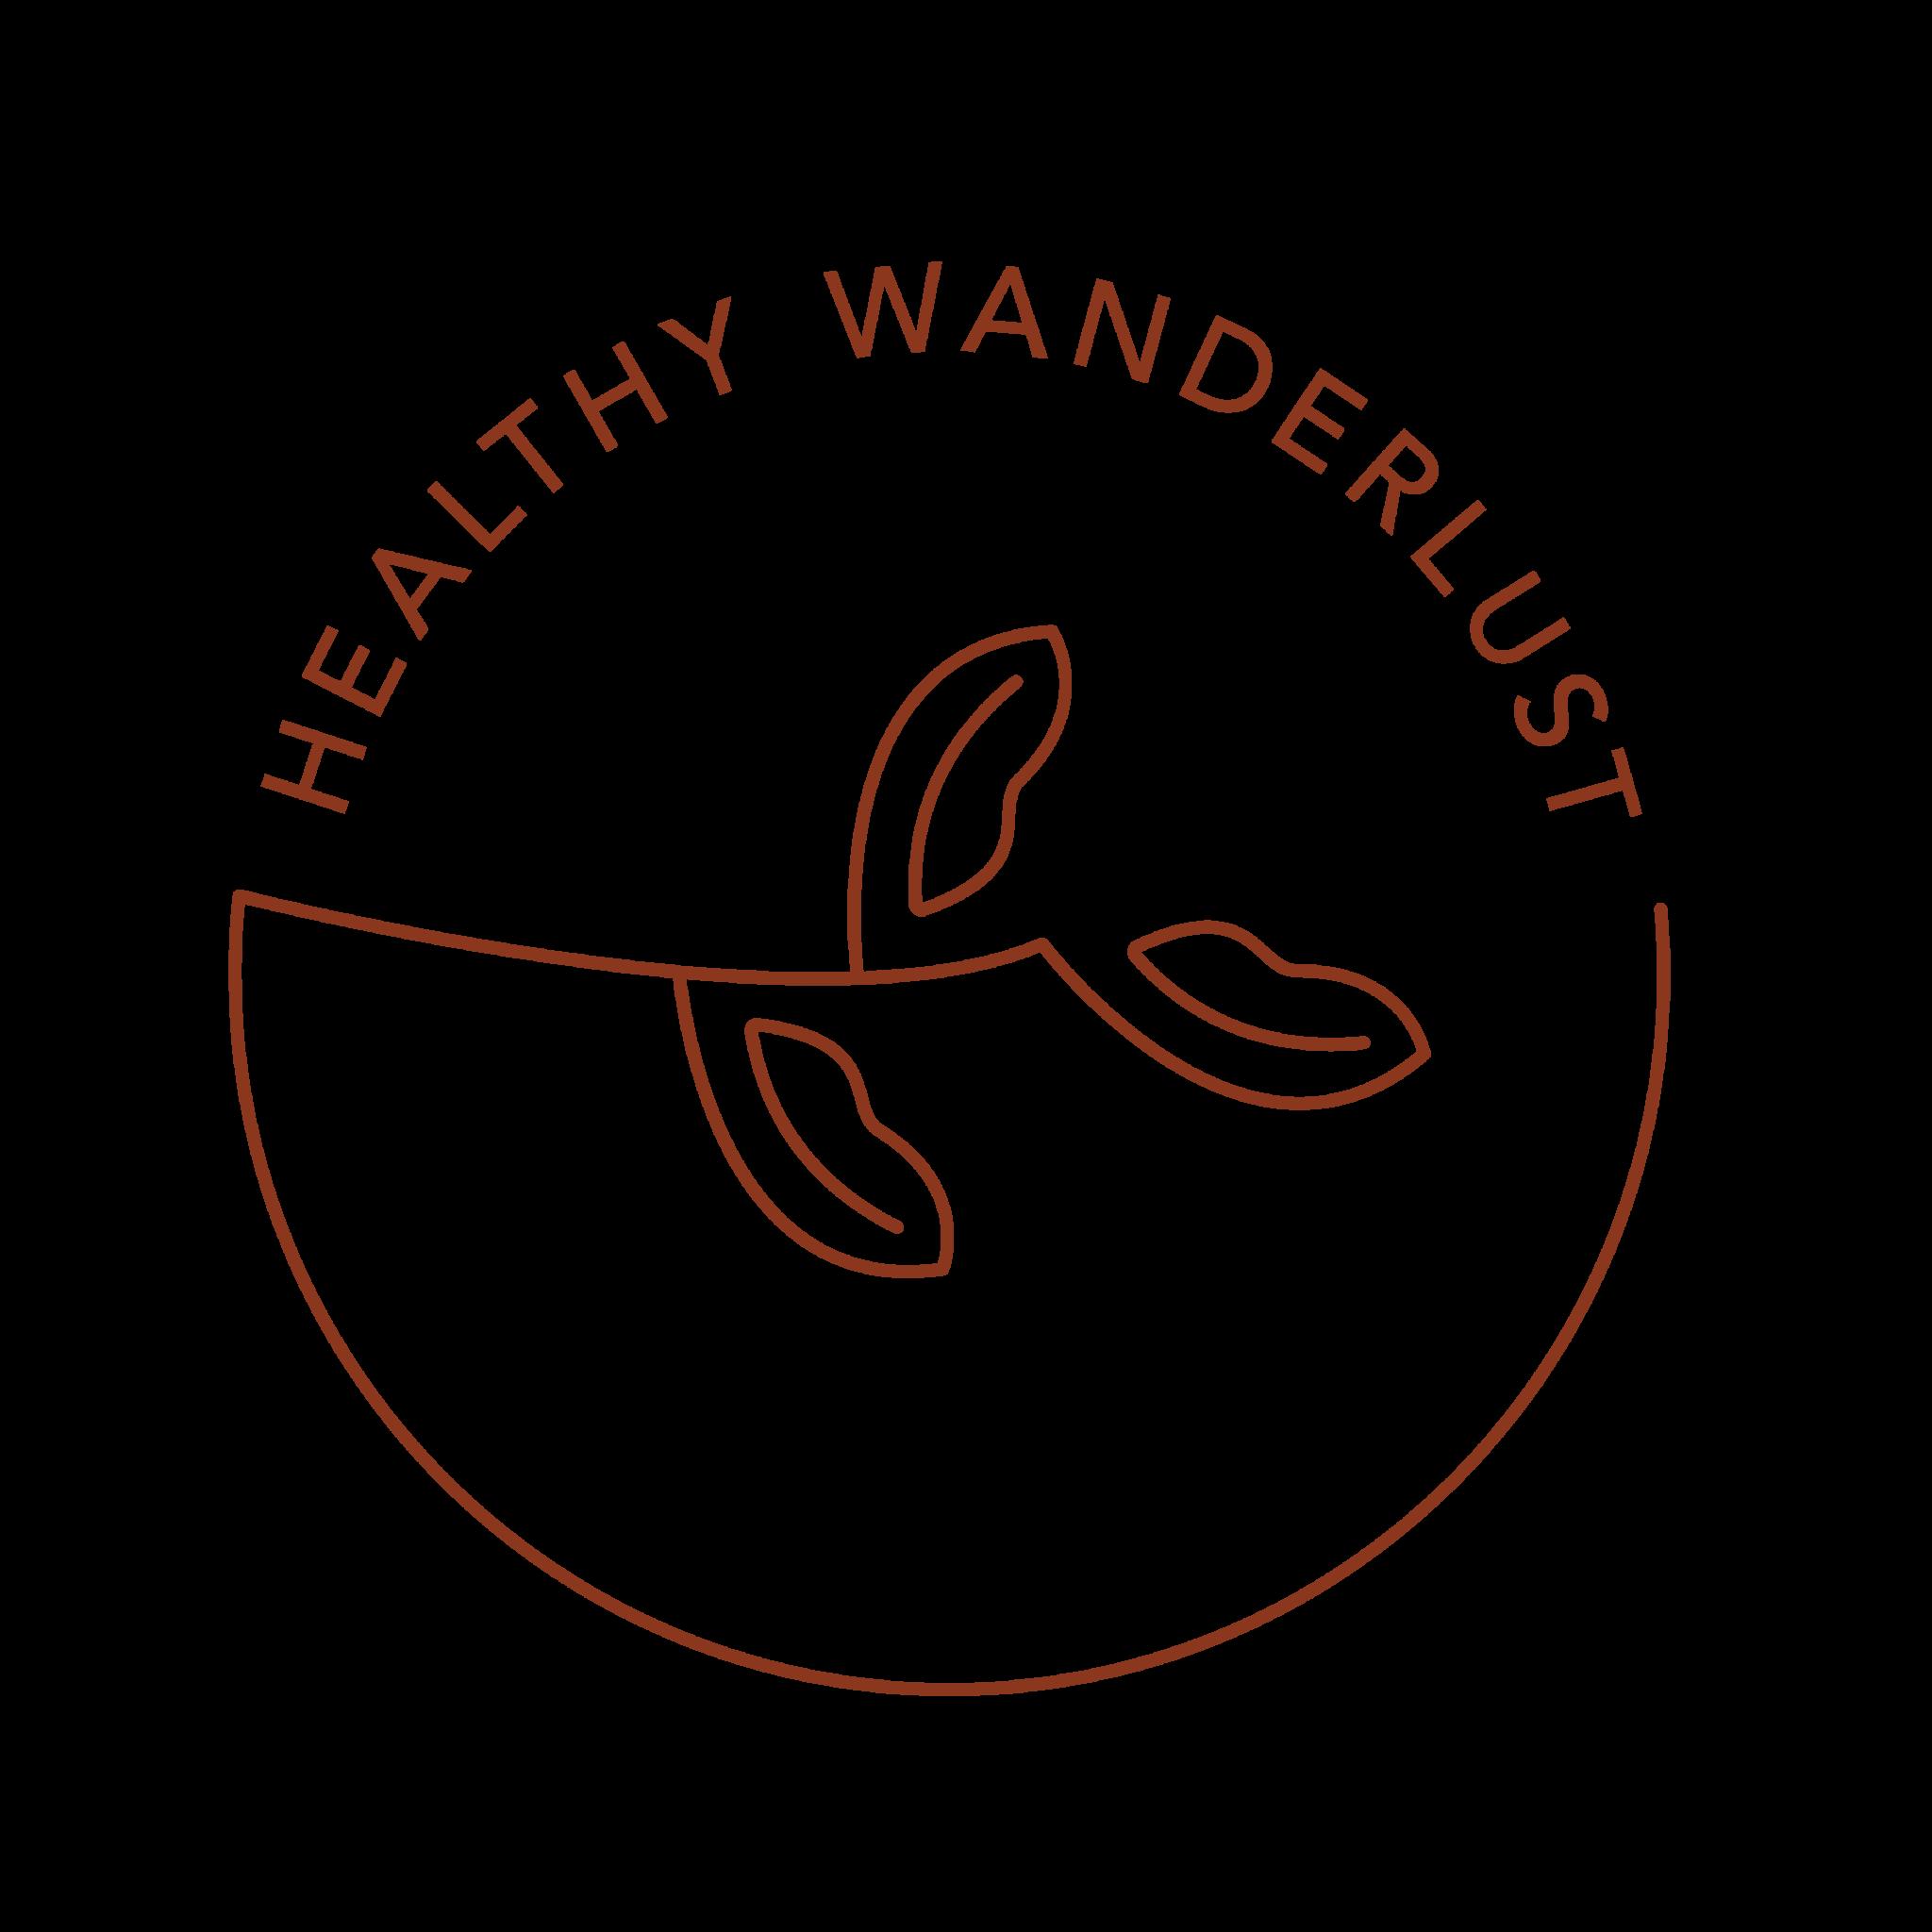 Healthy Wanderlust